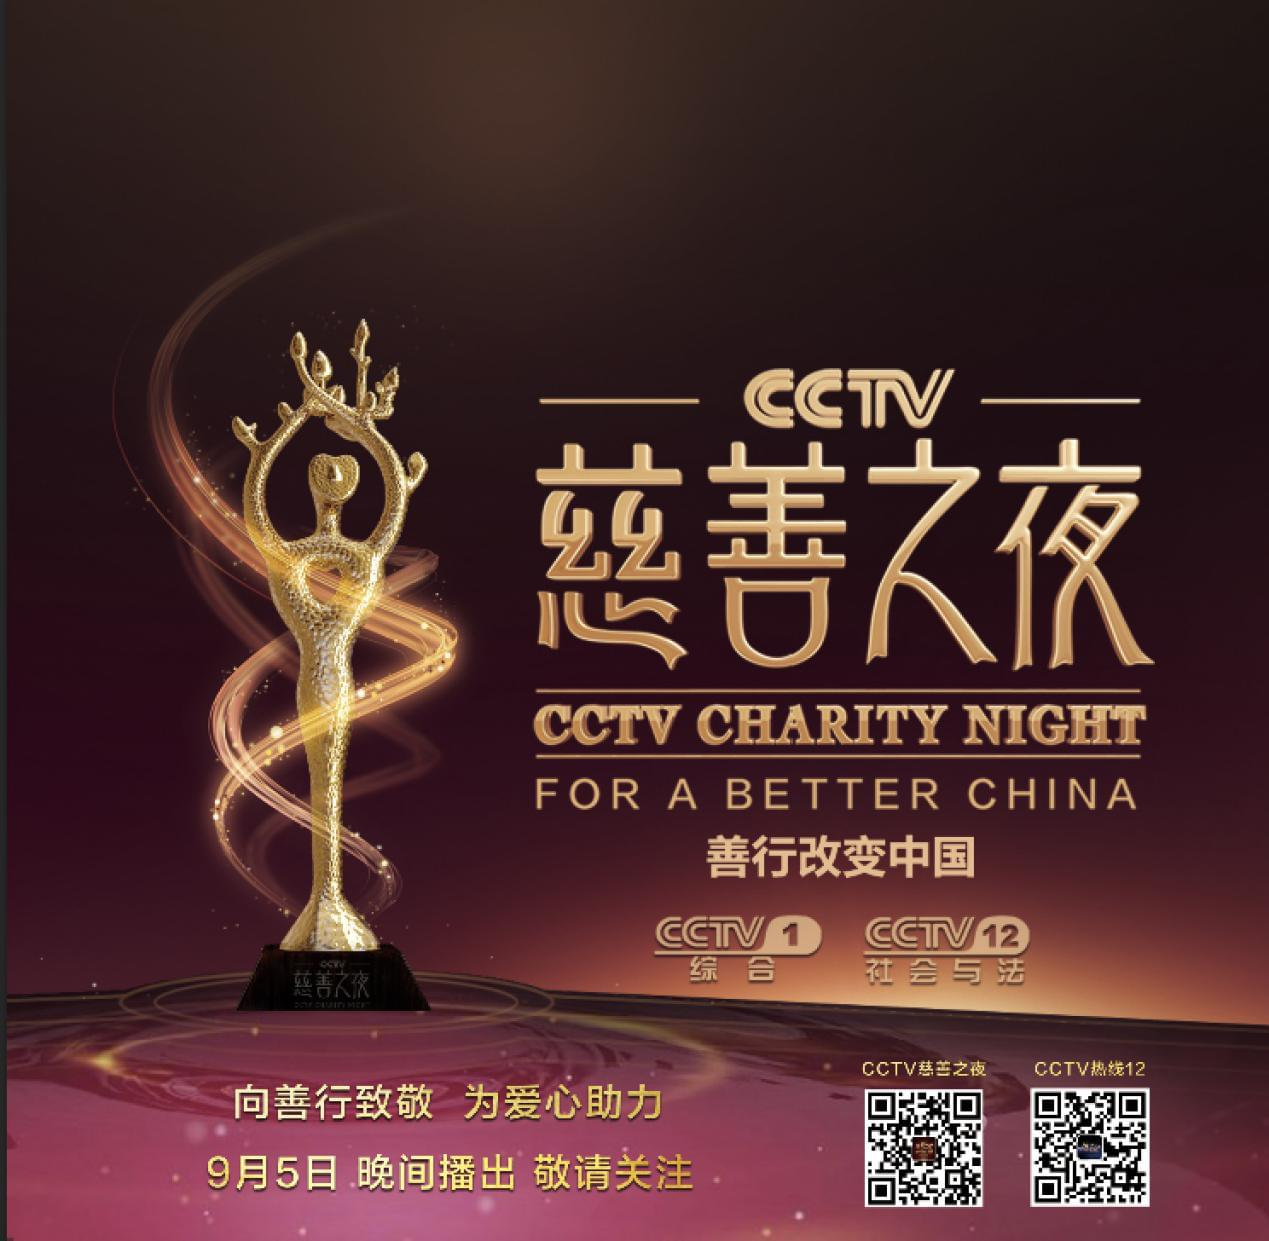 CCTV慈善之夜晚会倒计时 中华慈善日众星闪耀